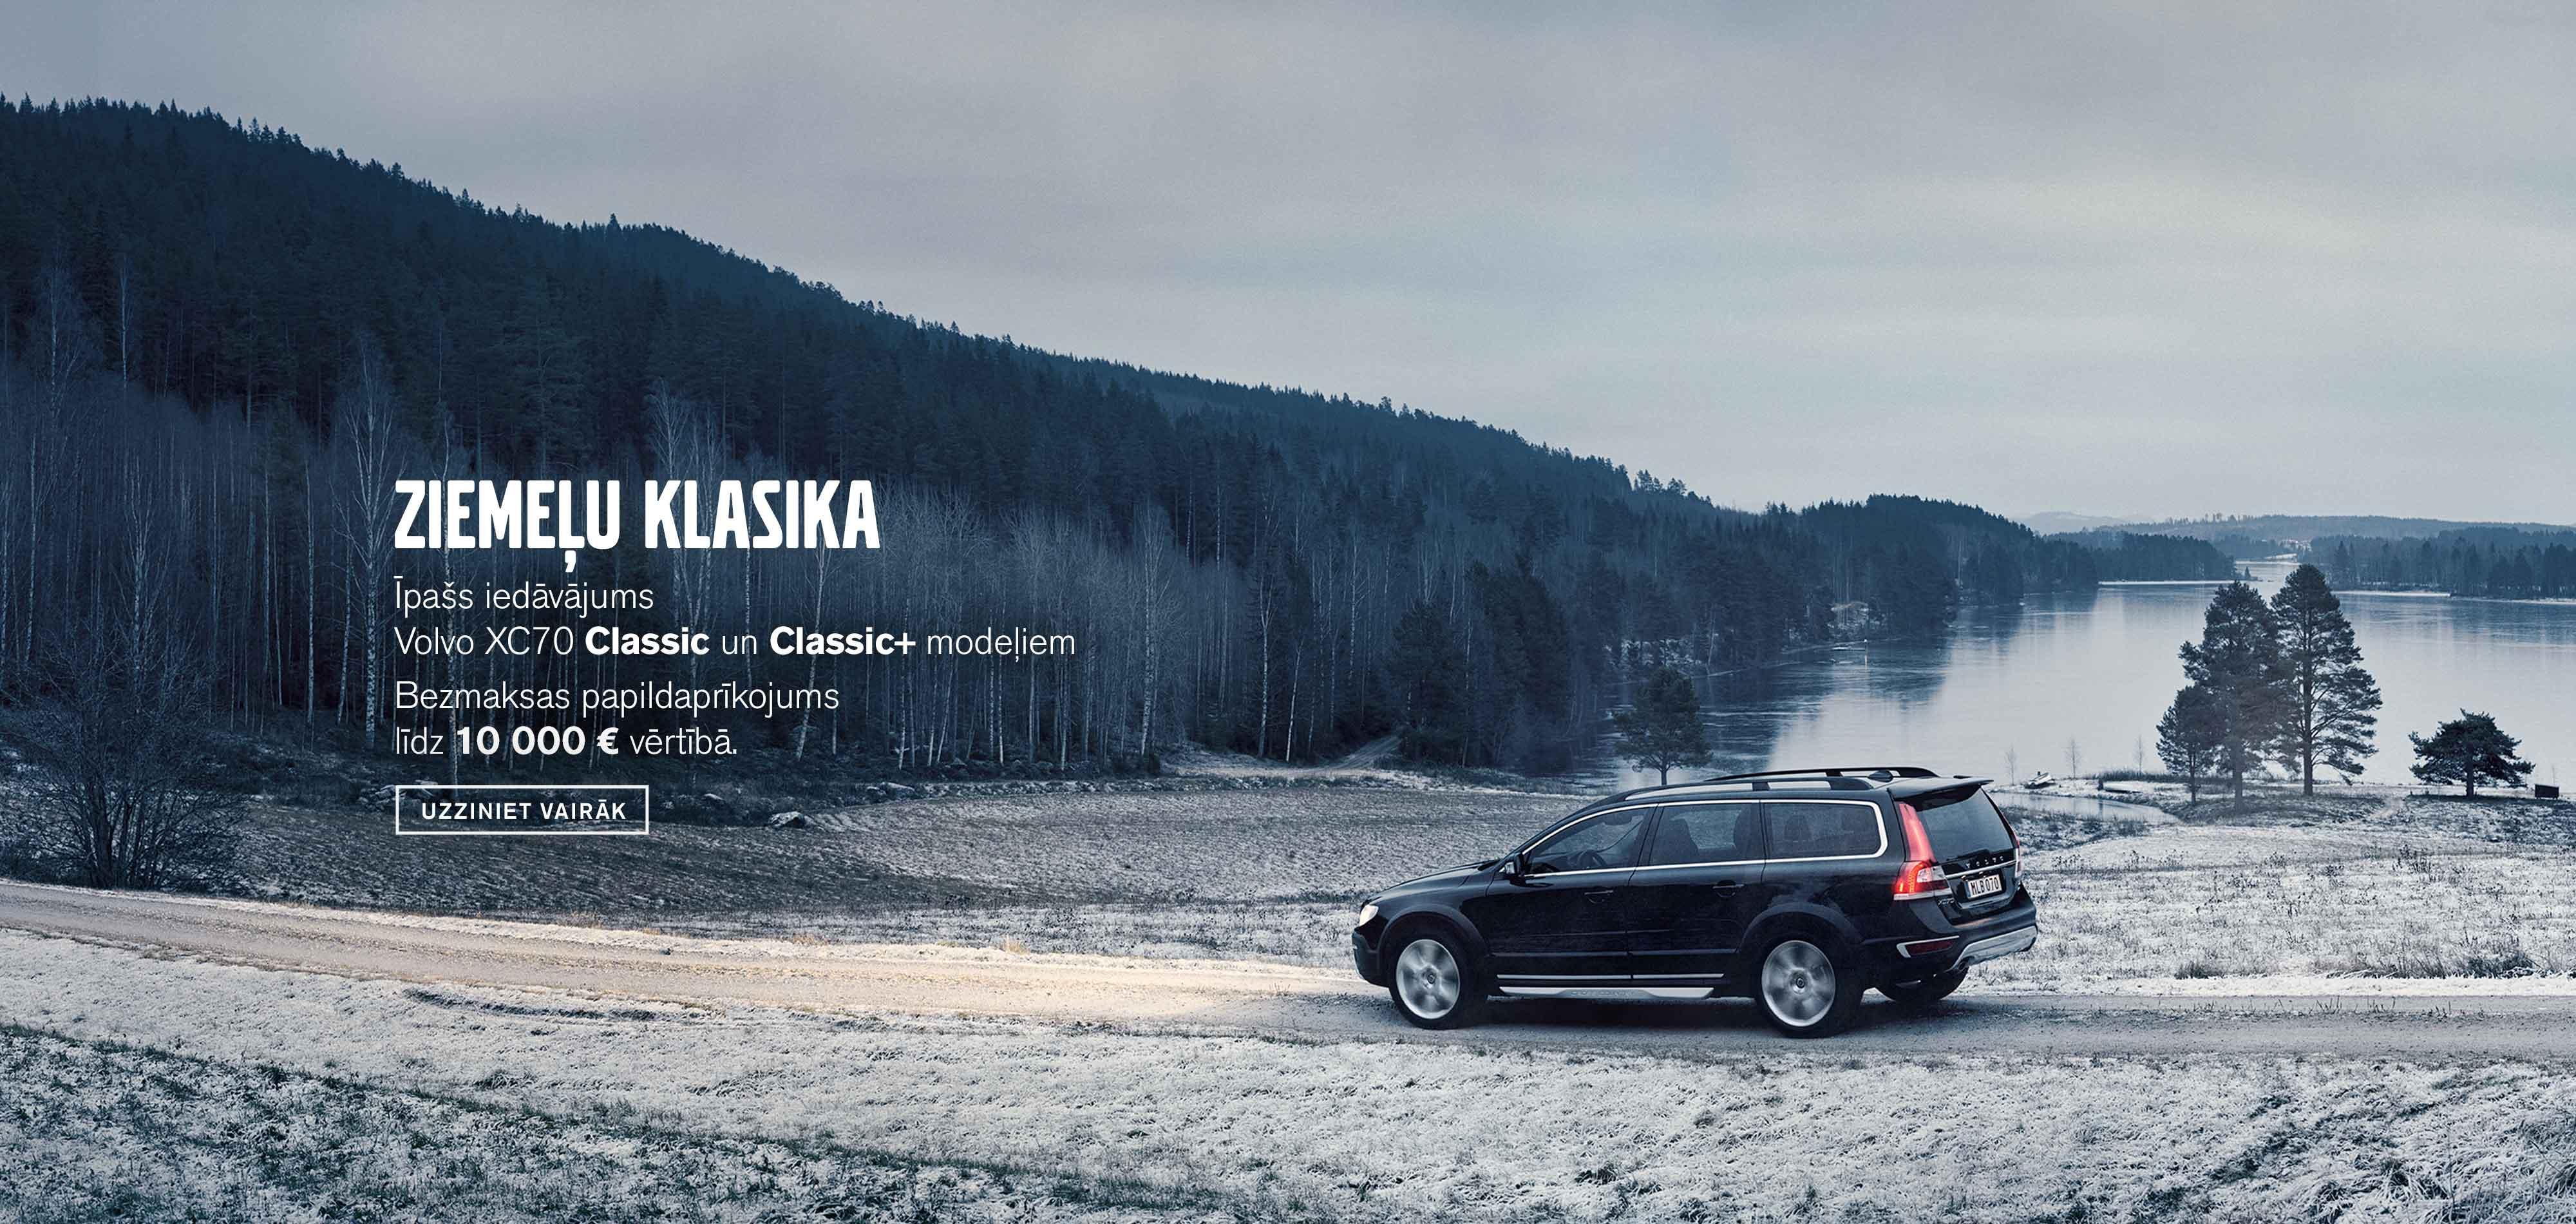 Volvo XC70 Klasikas kolekcija